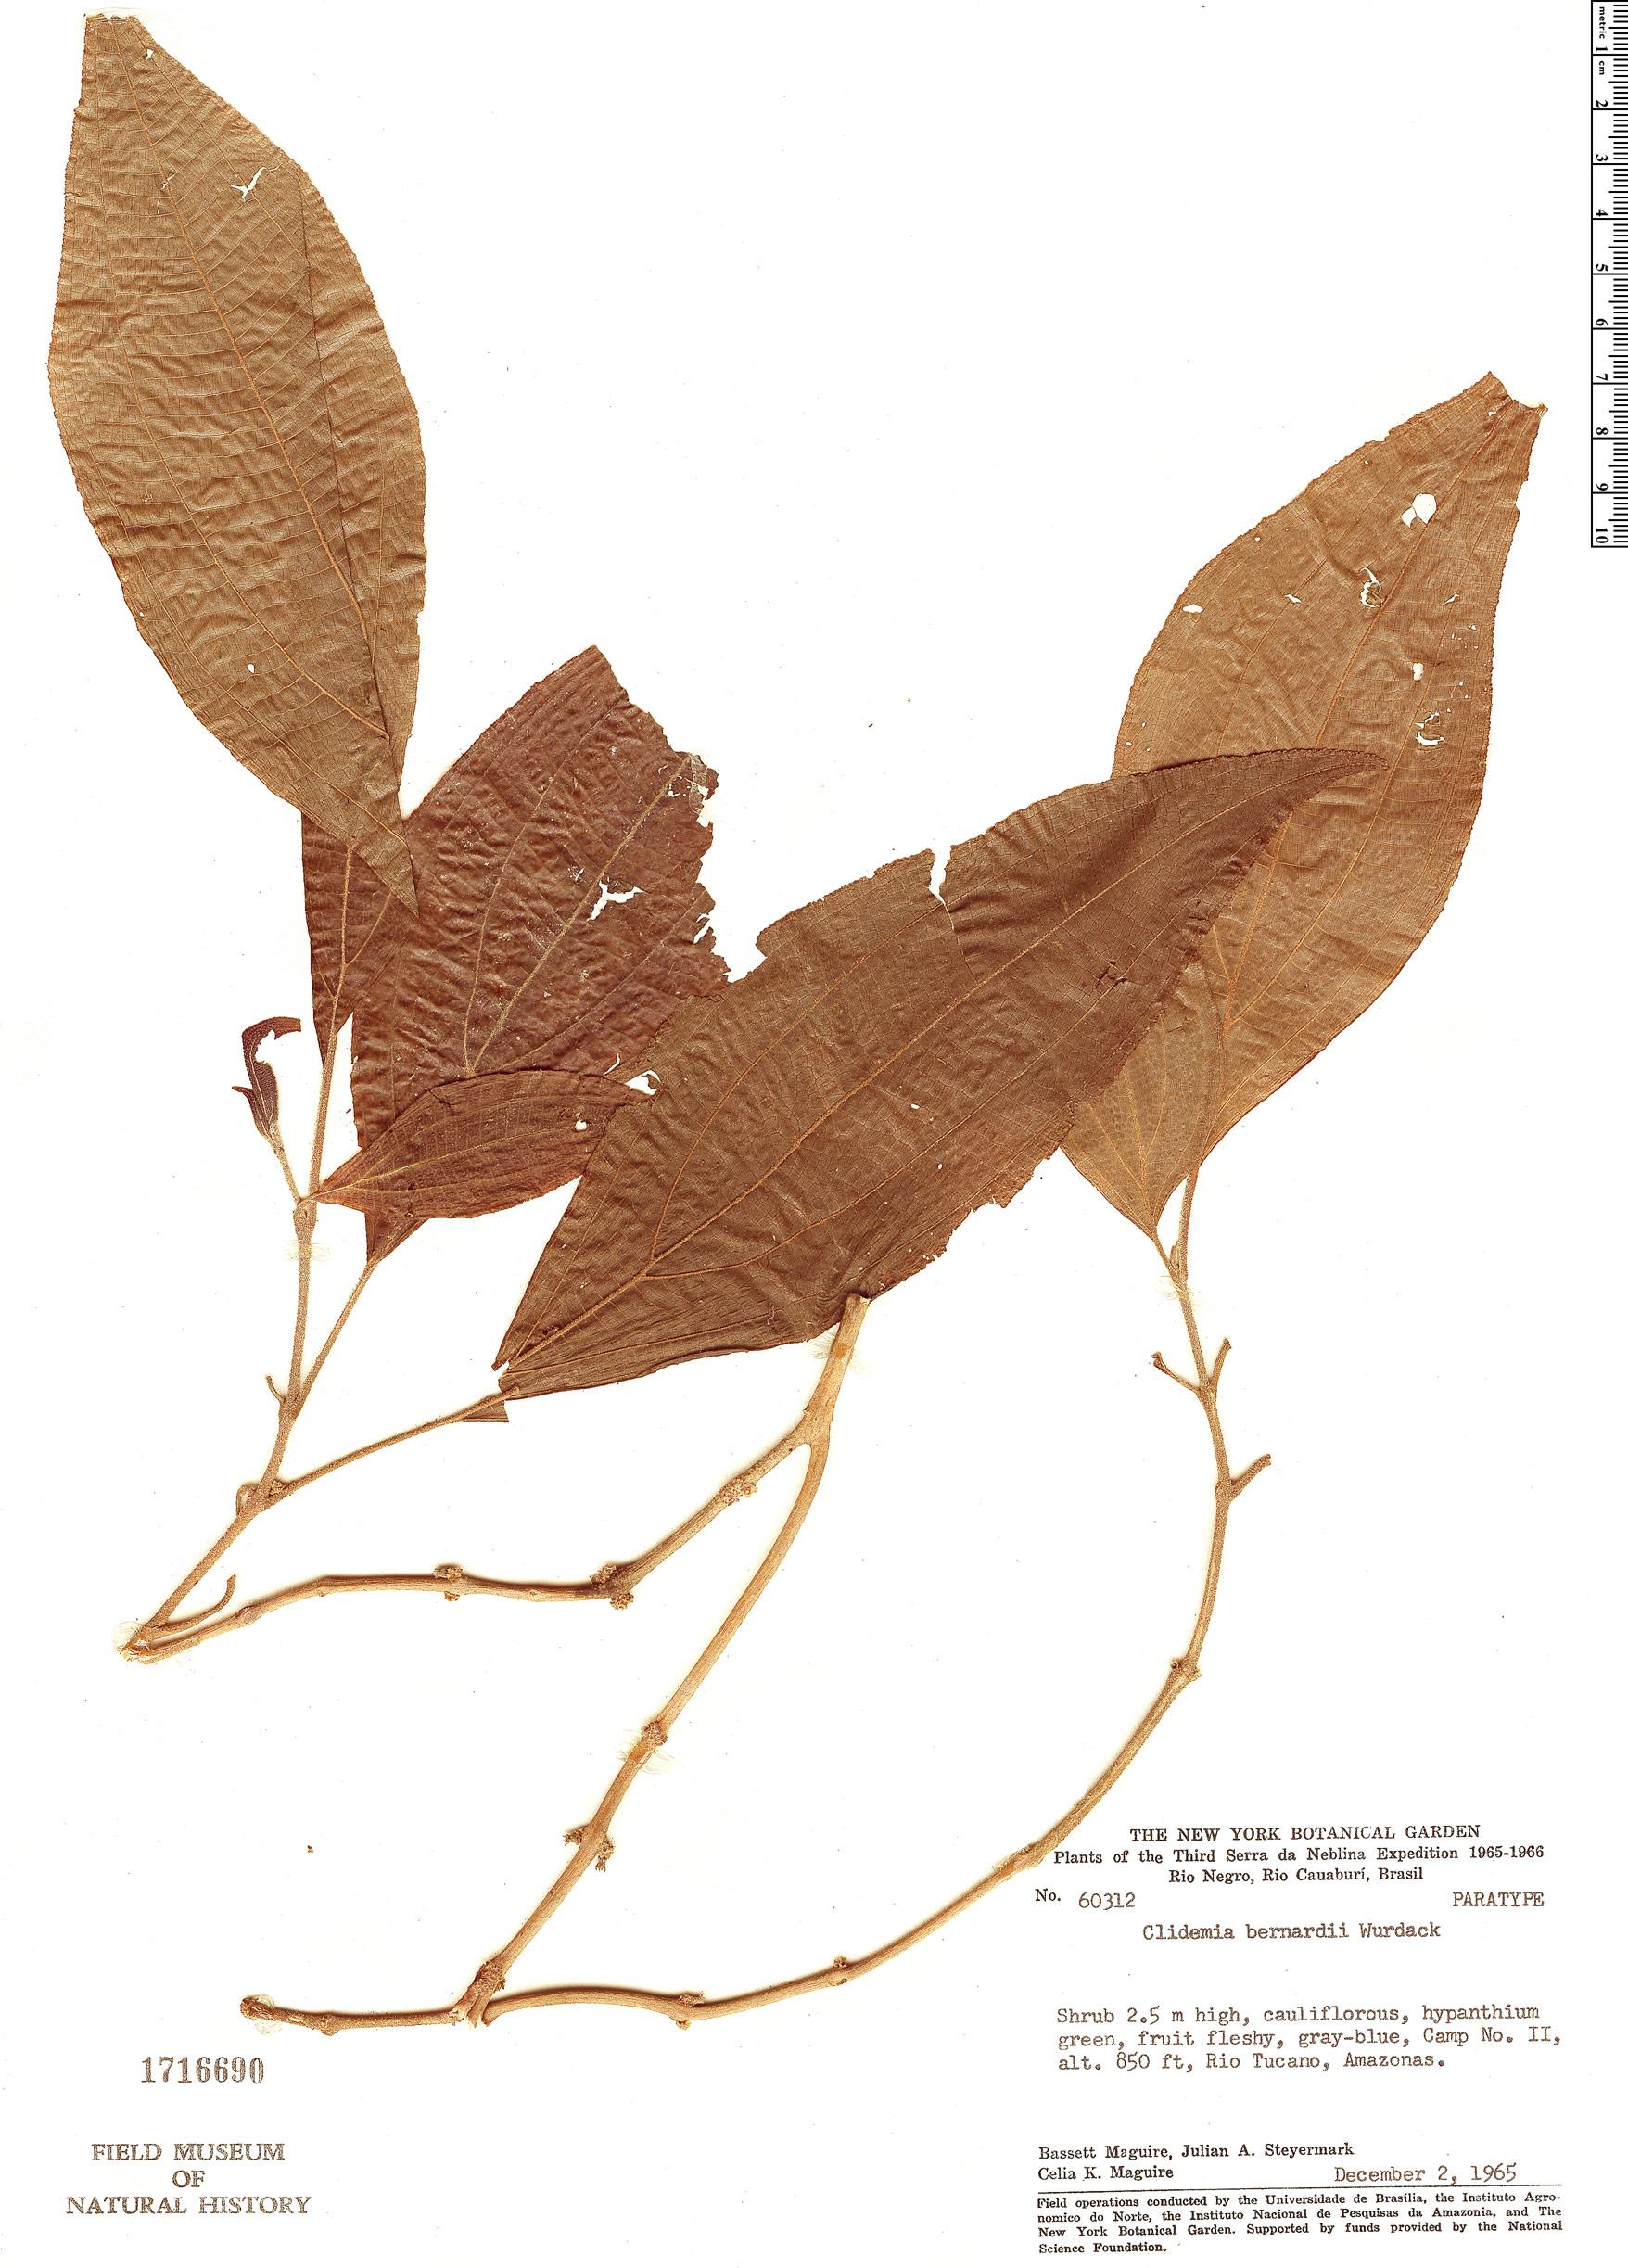 Specimen: Clidemia bernardii